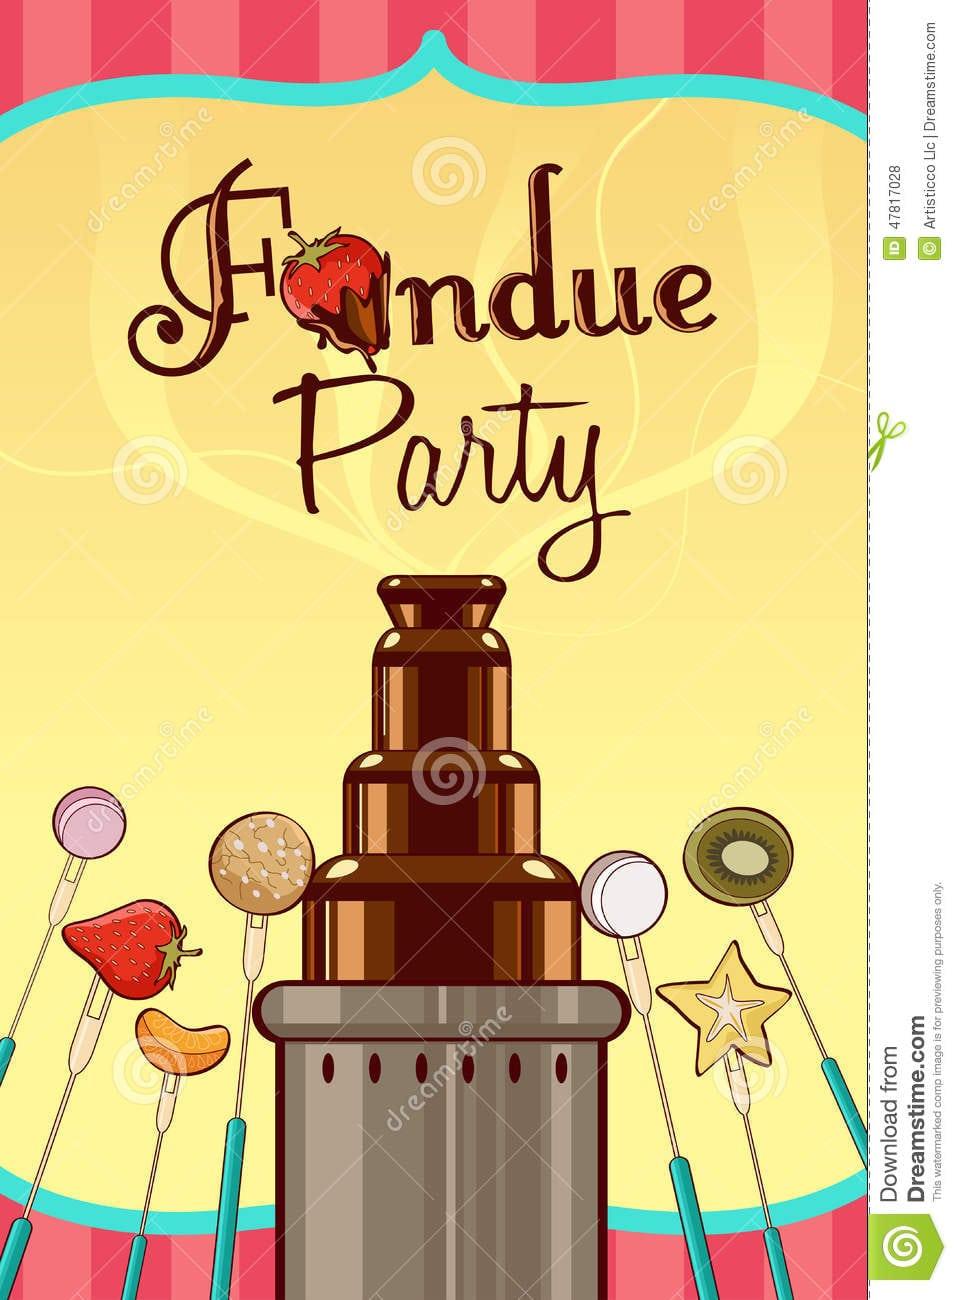 Fondue Party Invitation Stock Vector  Illustration Of Copyspace